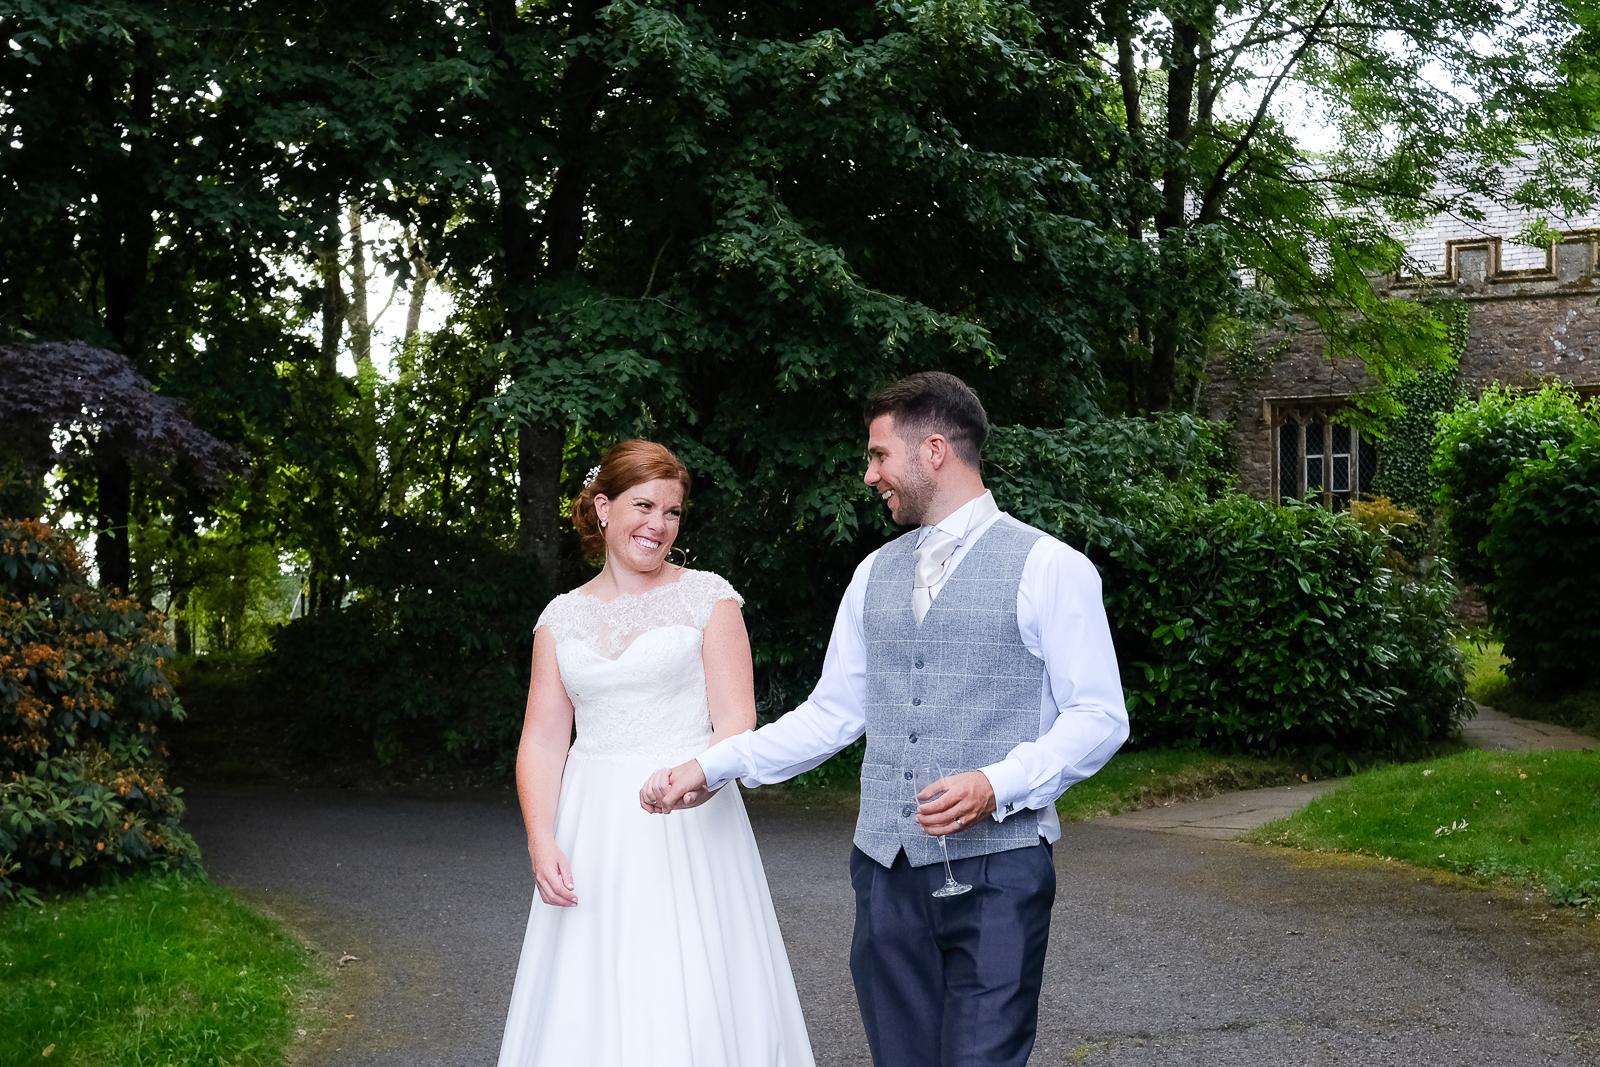 Bridwell+Park+Wedding+Photography077.jpg